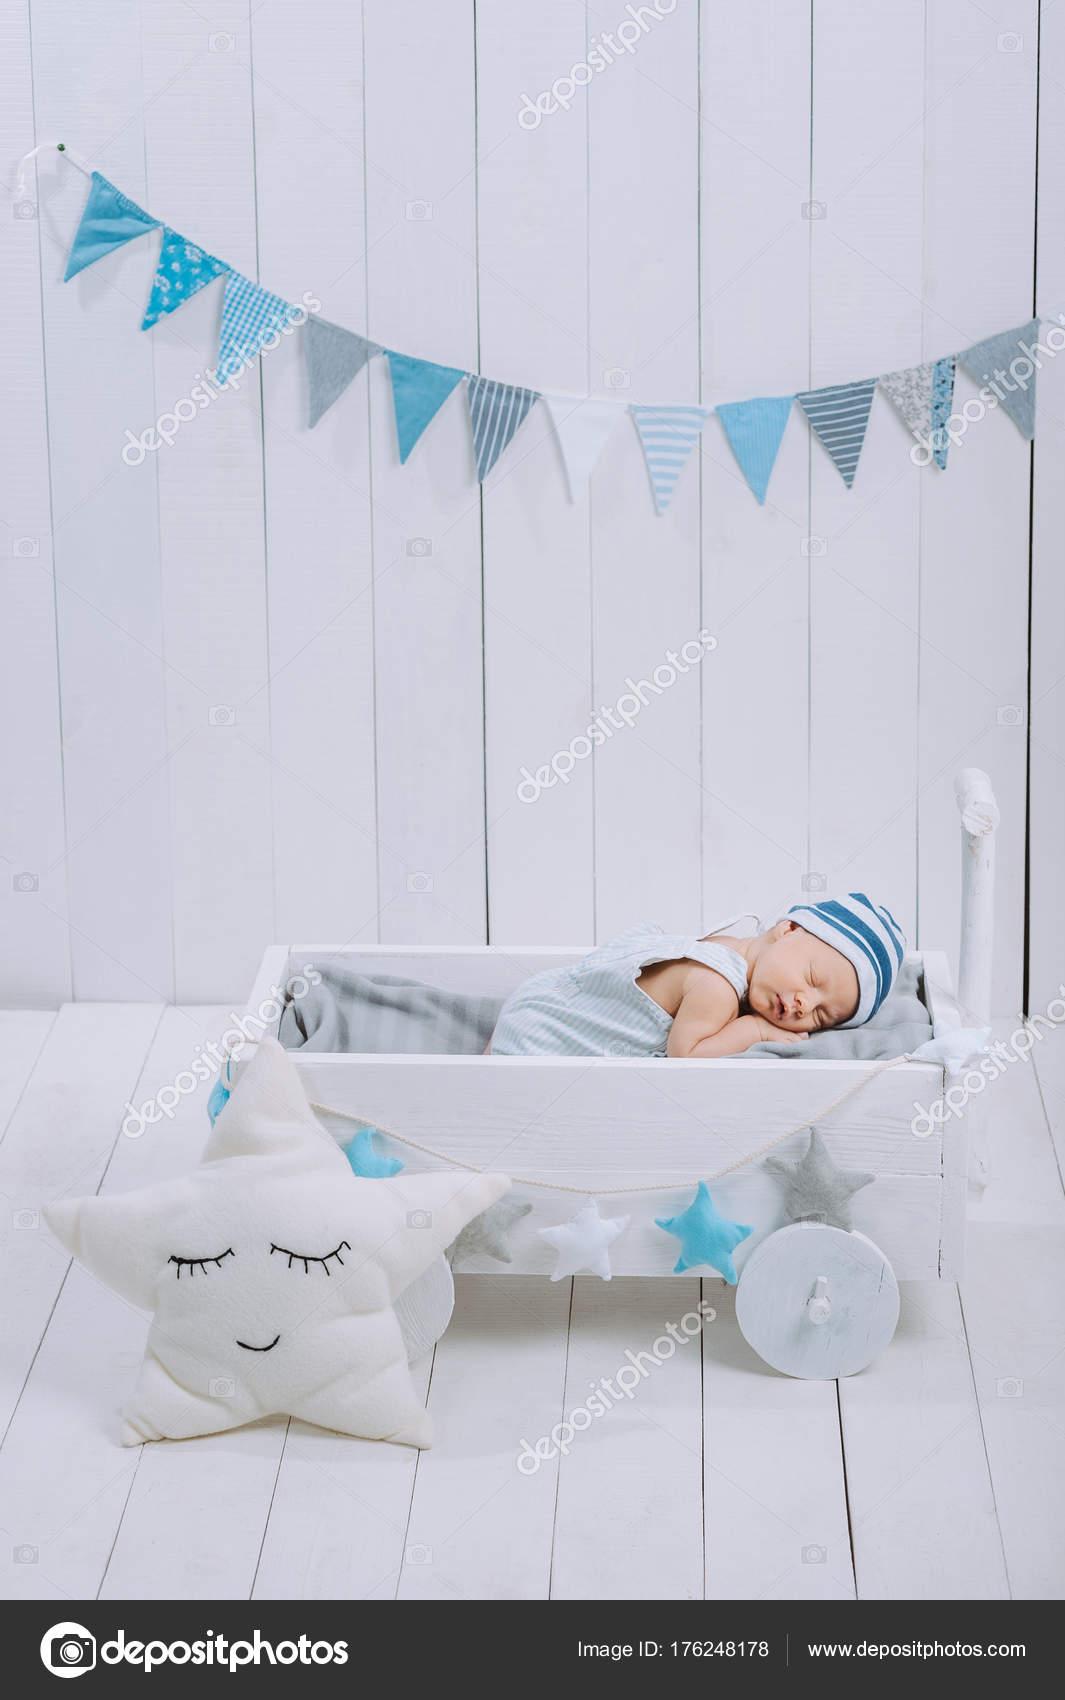 2c0a0789561 Χαριτωμένο Μωρό Νεογέννητο Στο Καπέλο Στον Ύπνο Ξύλινο Κρεβατάκι Μωρού —  Φωτογραφία Αρχείου